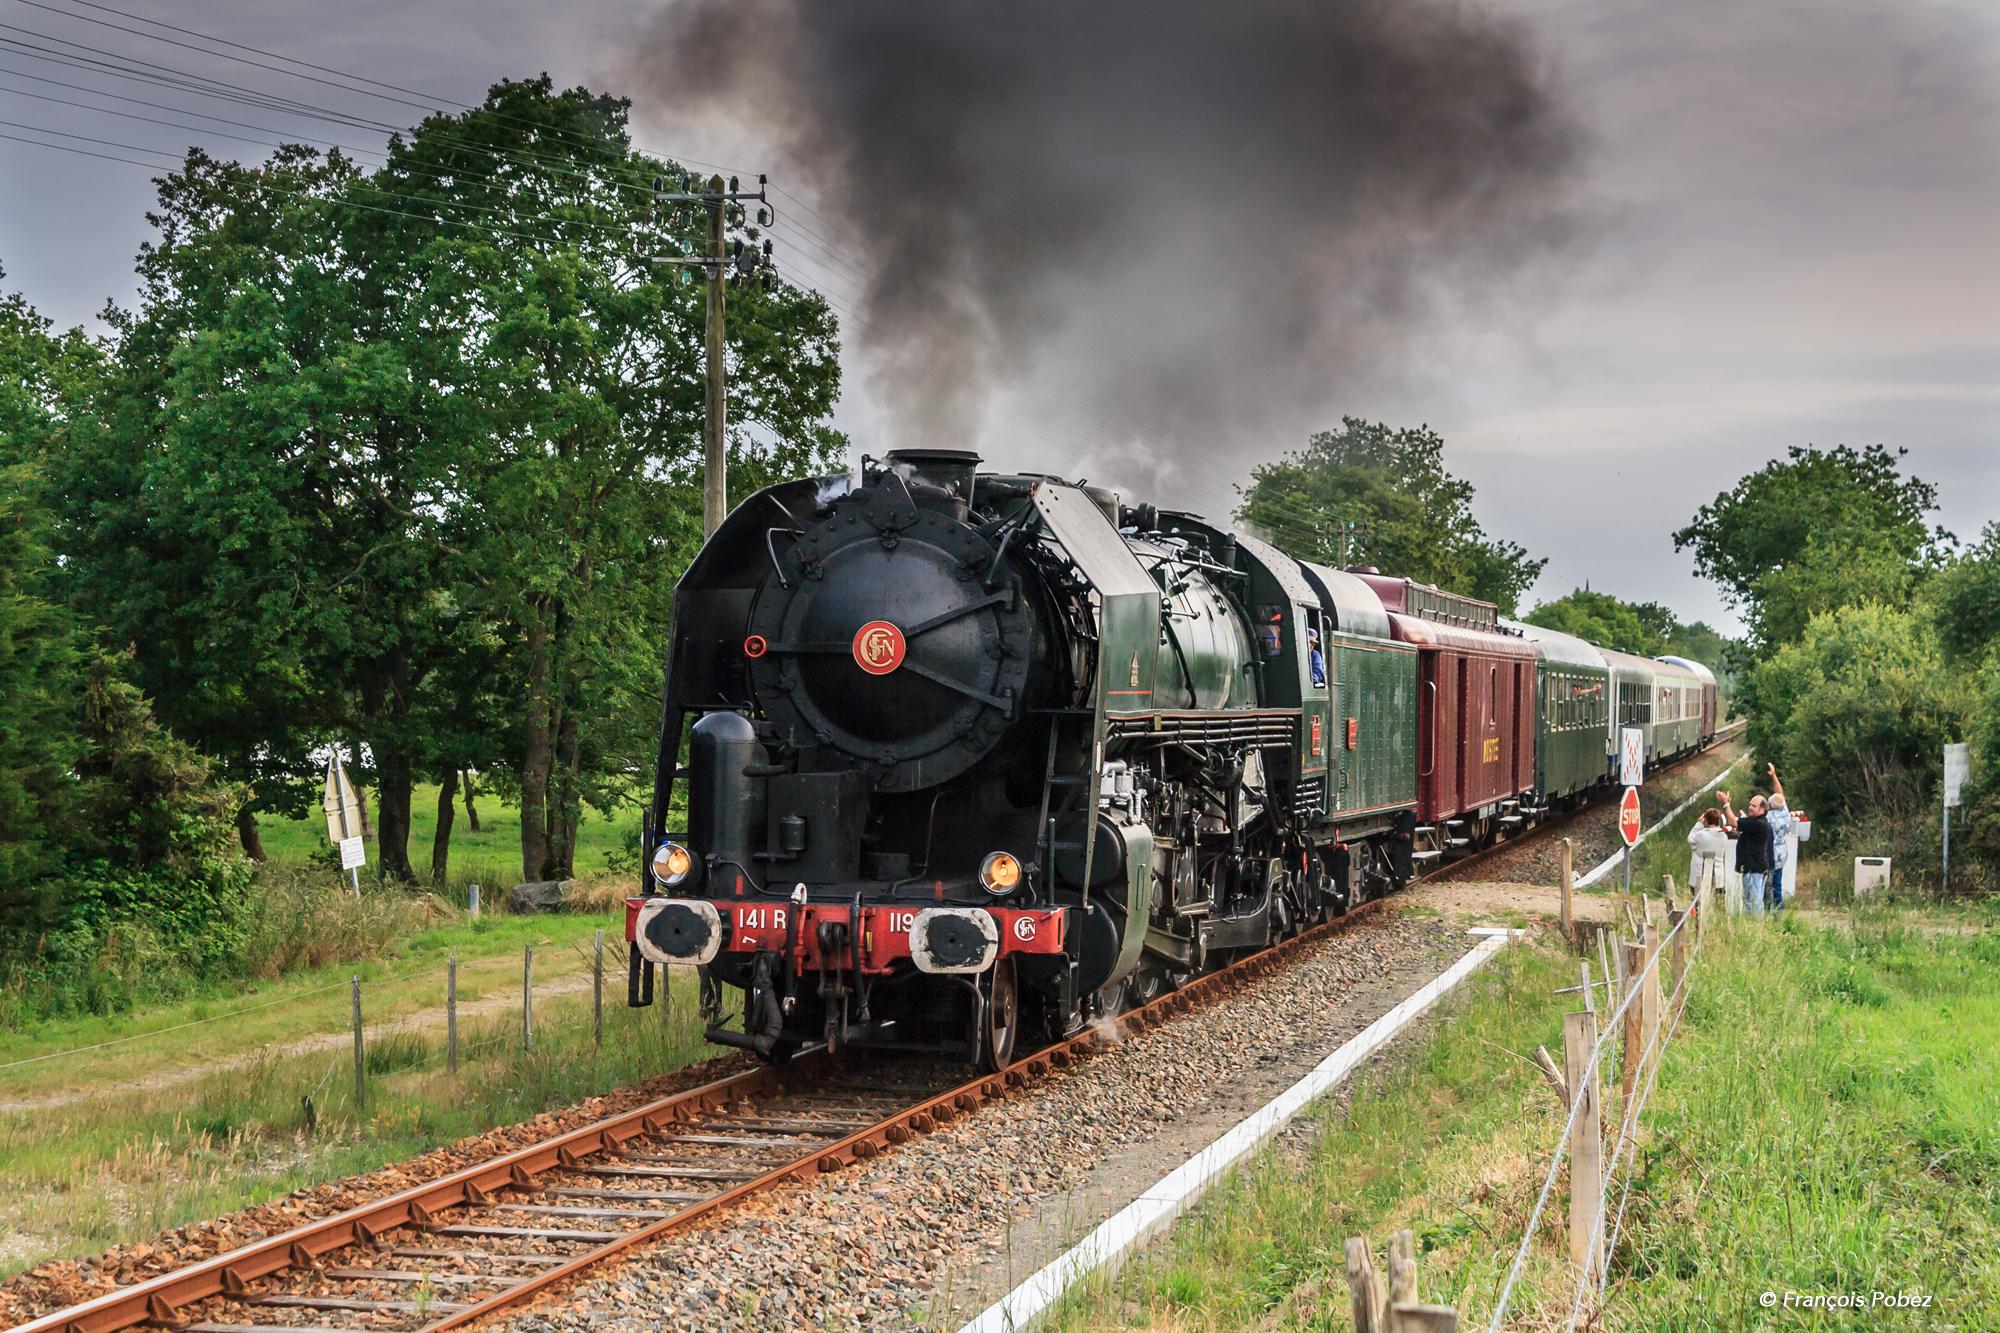 wallpaper vehicle train station locomotive sncf nantes tree plant track touristique. Black Bedroom Furniture Sets. Home Design Ideas